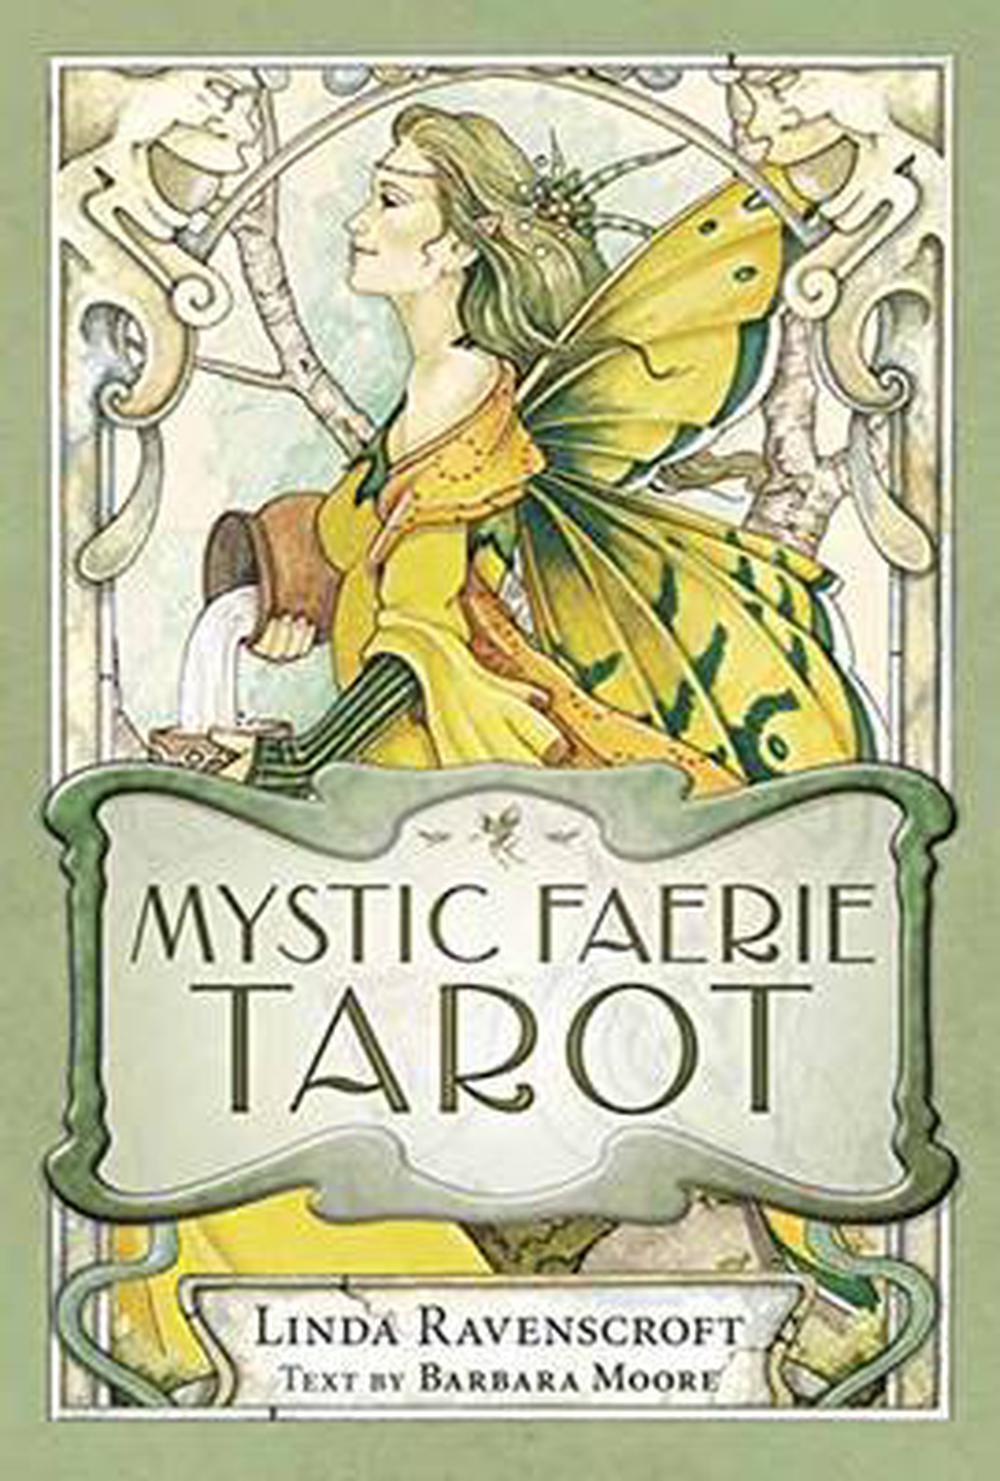 Mystic Faerie Tarot Review